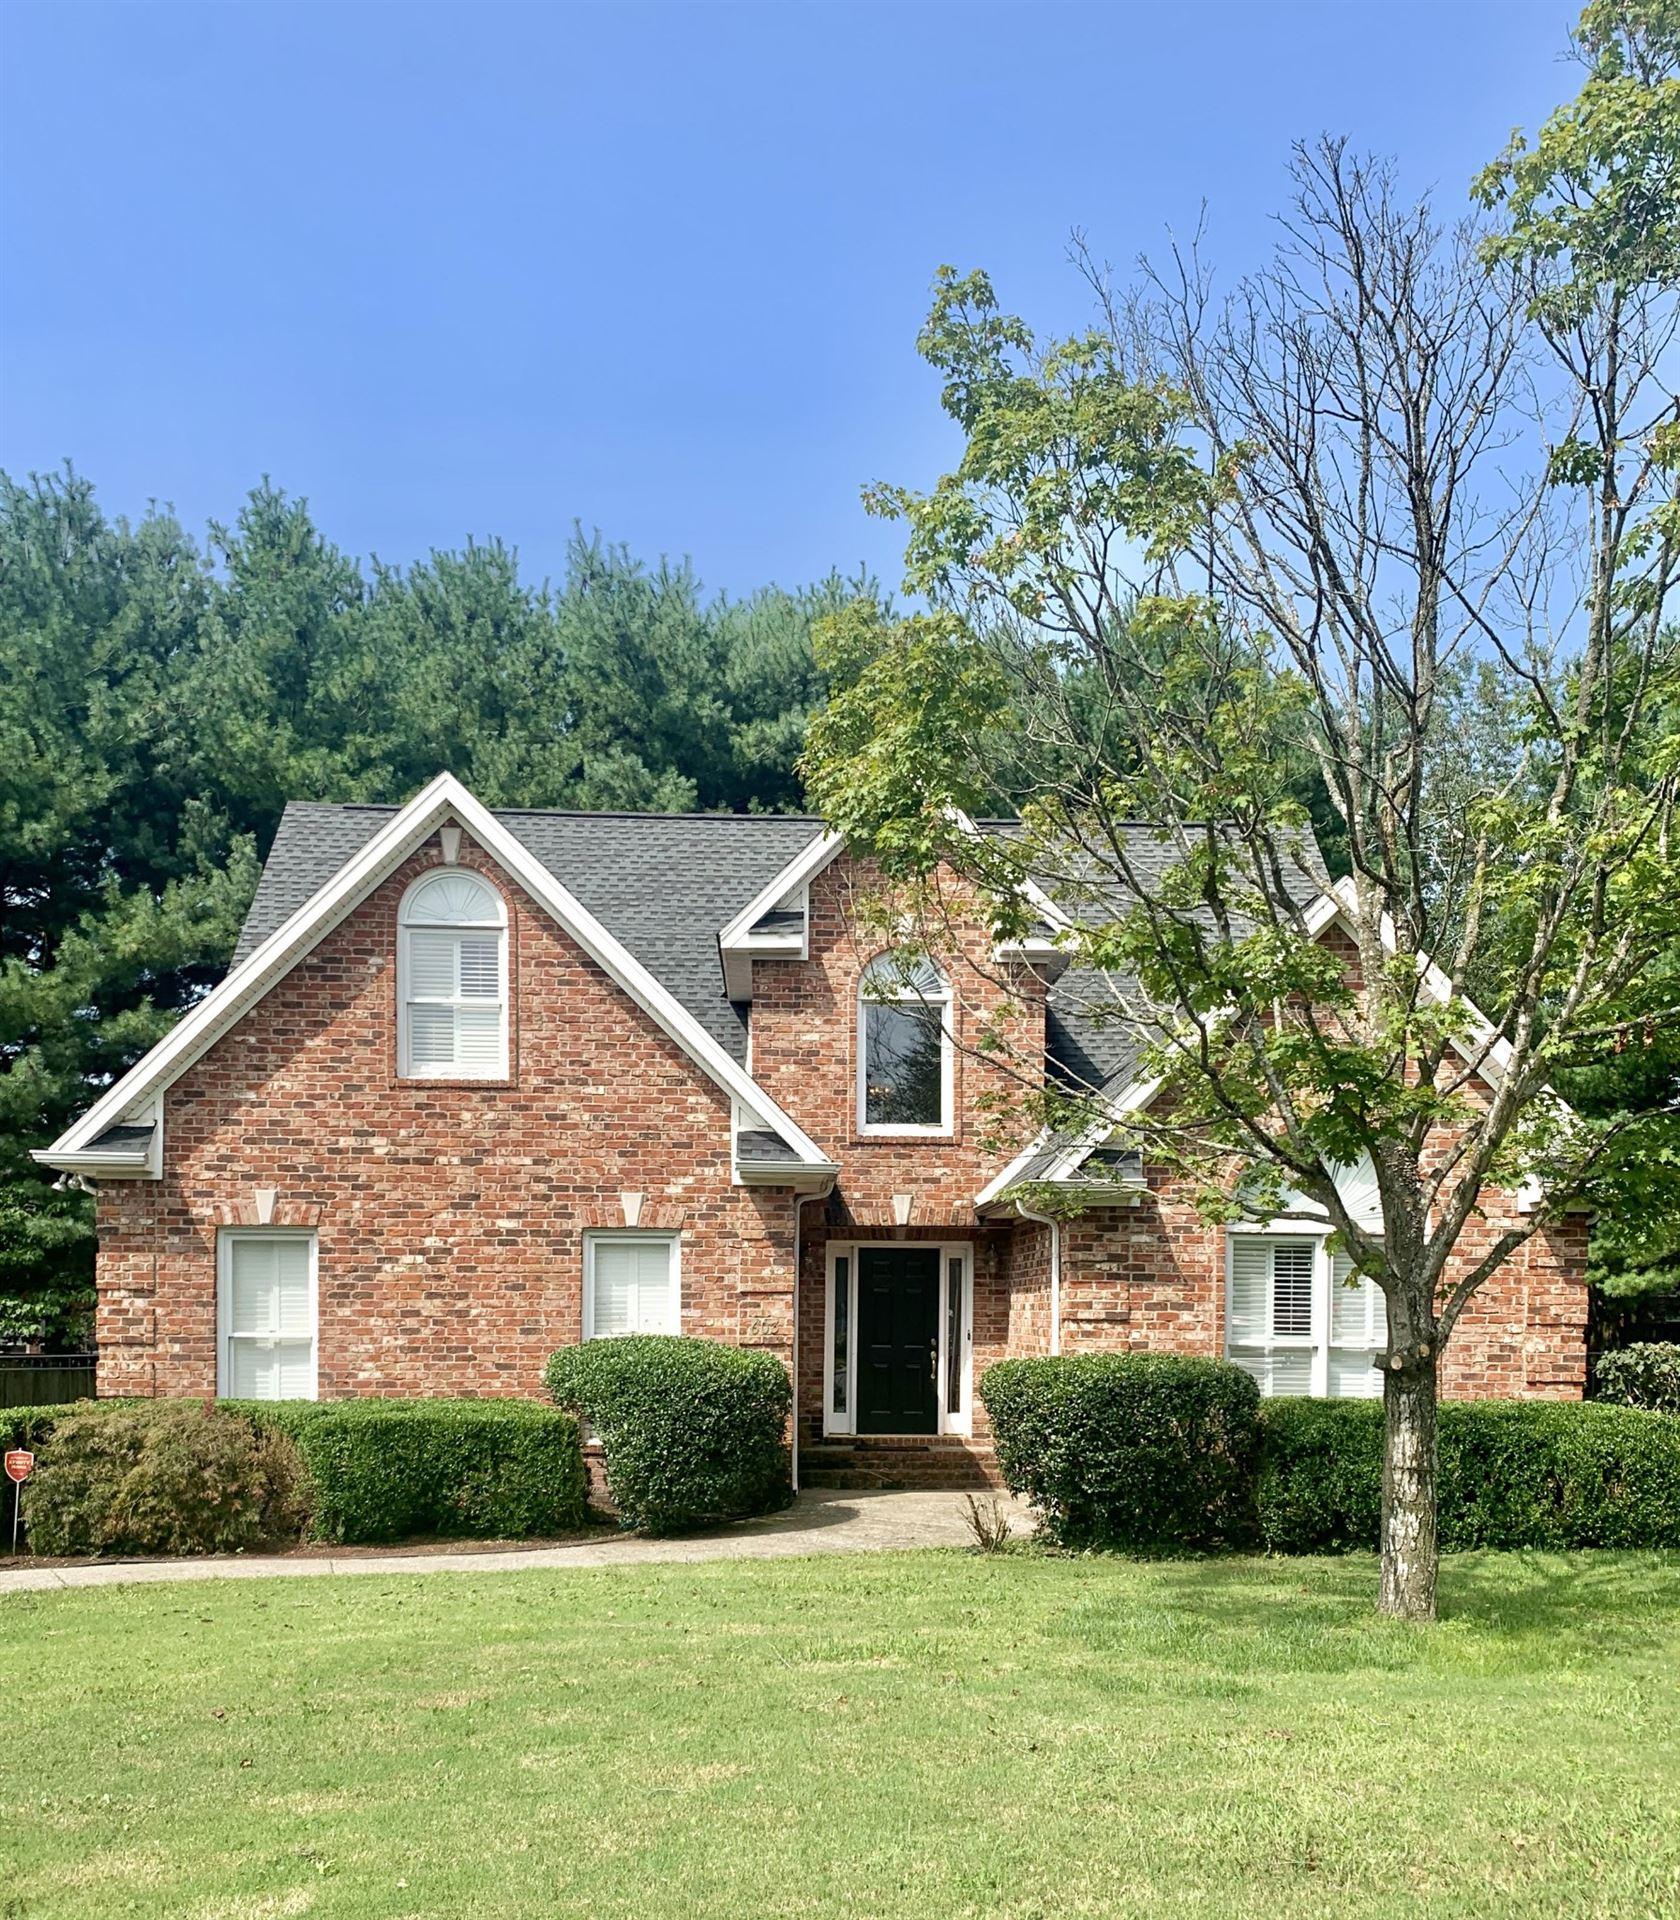 603 Saratoga Dr, Murfreesboro, TN 37130 - MLS#: 2191523